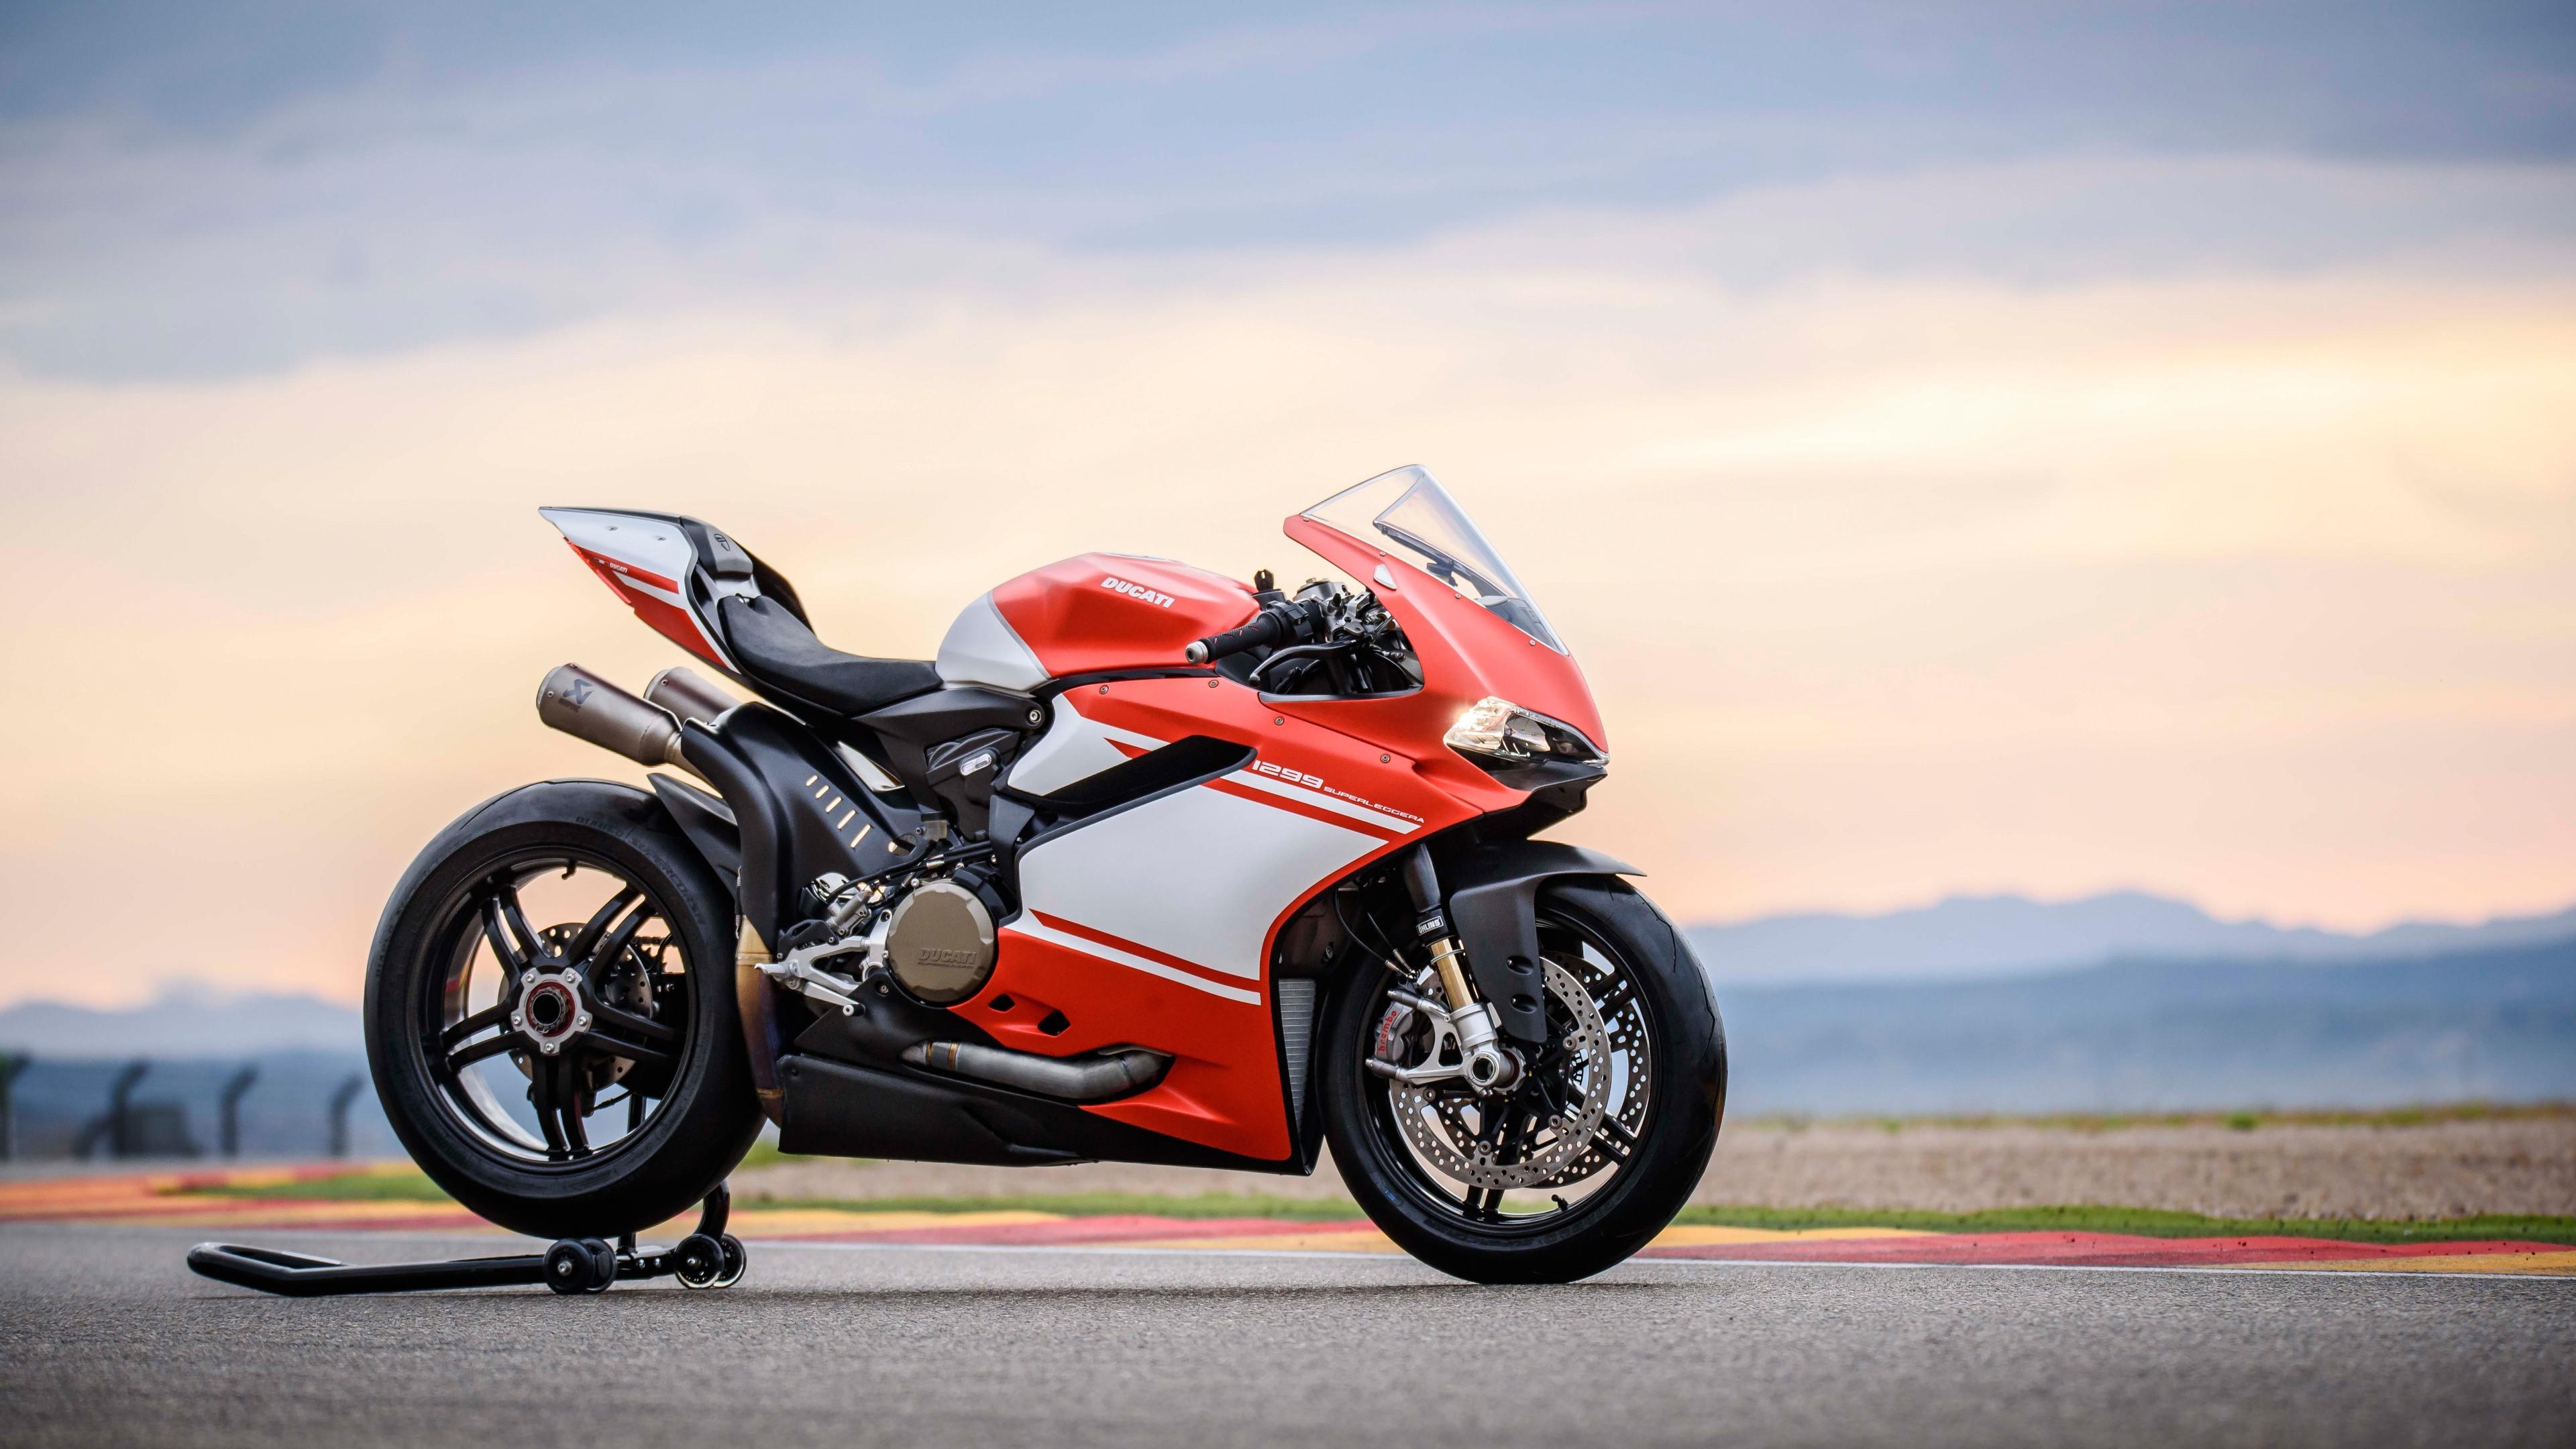 3d Sports Bike Wallpapers Ducati 1299 Superleggera 4k 8k Wallpapers Hd Wallpapers